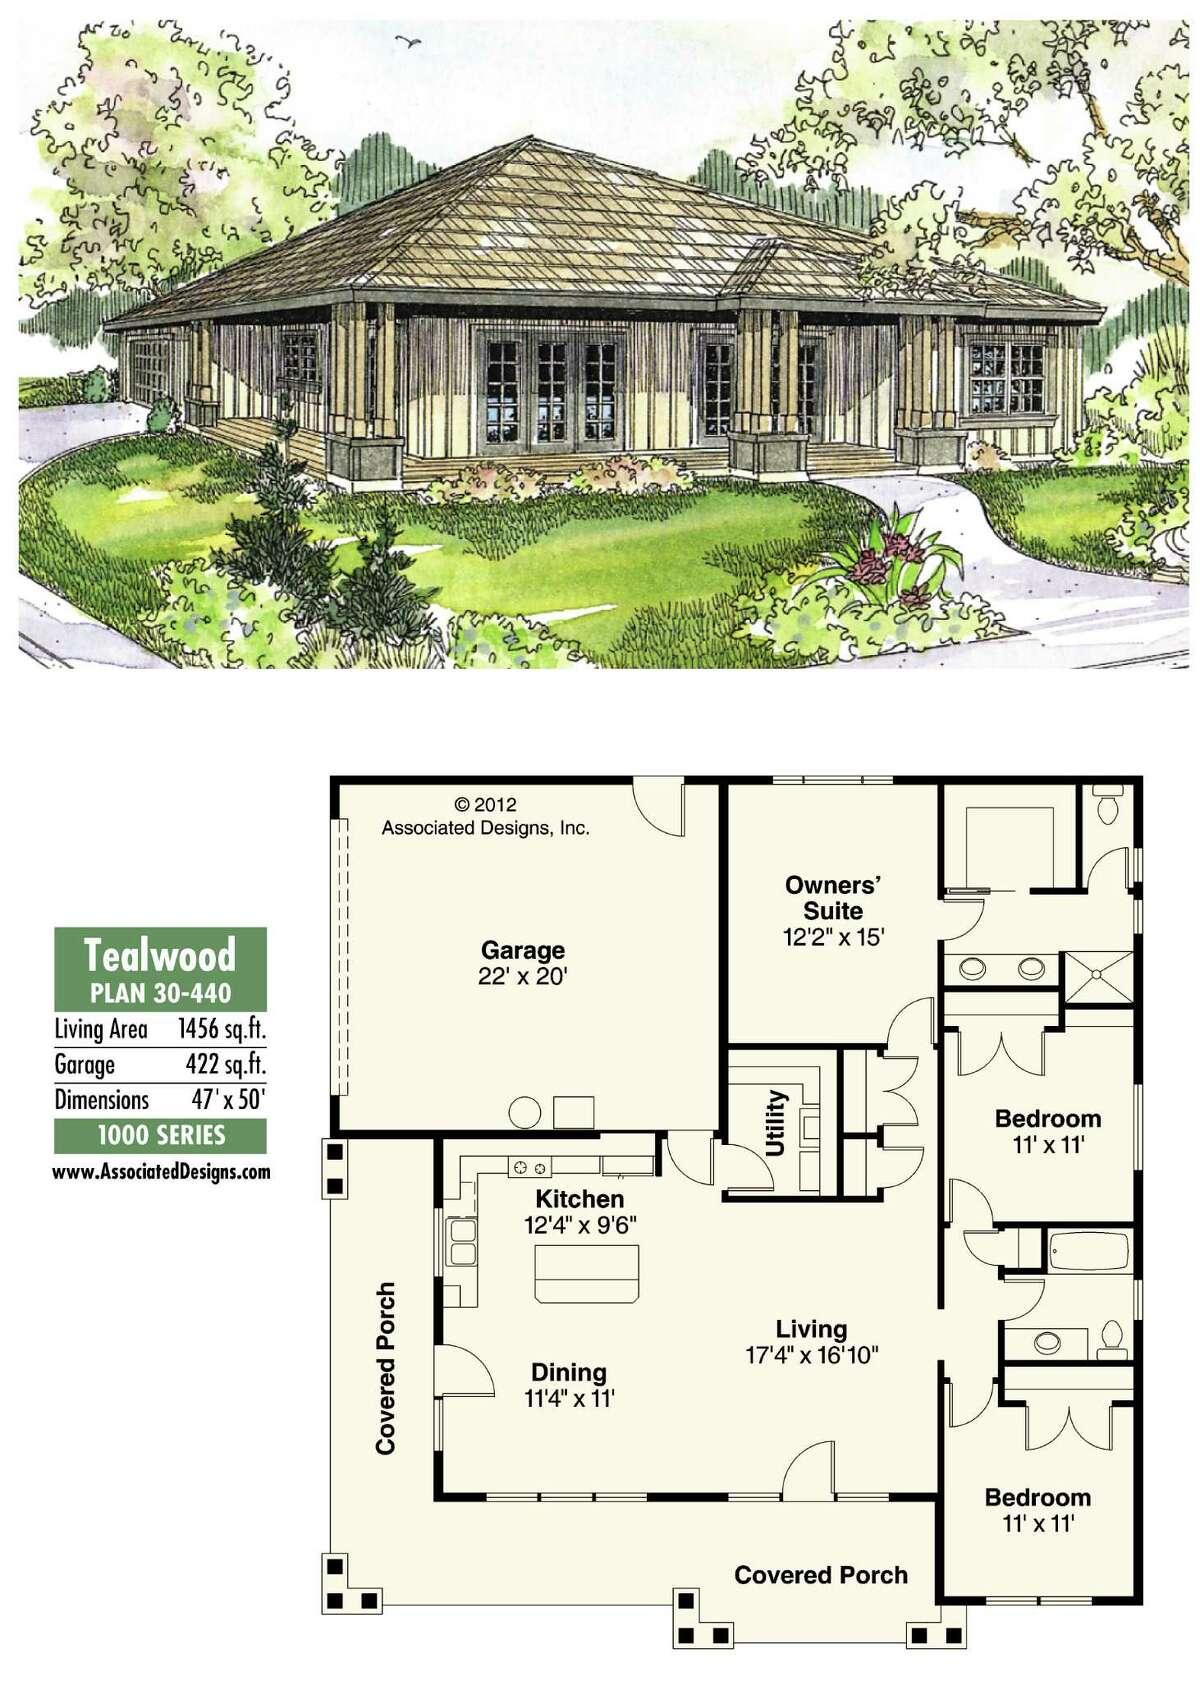 Tealwood Plan 30-44-